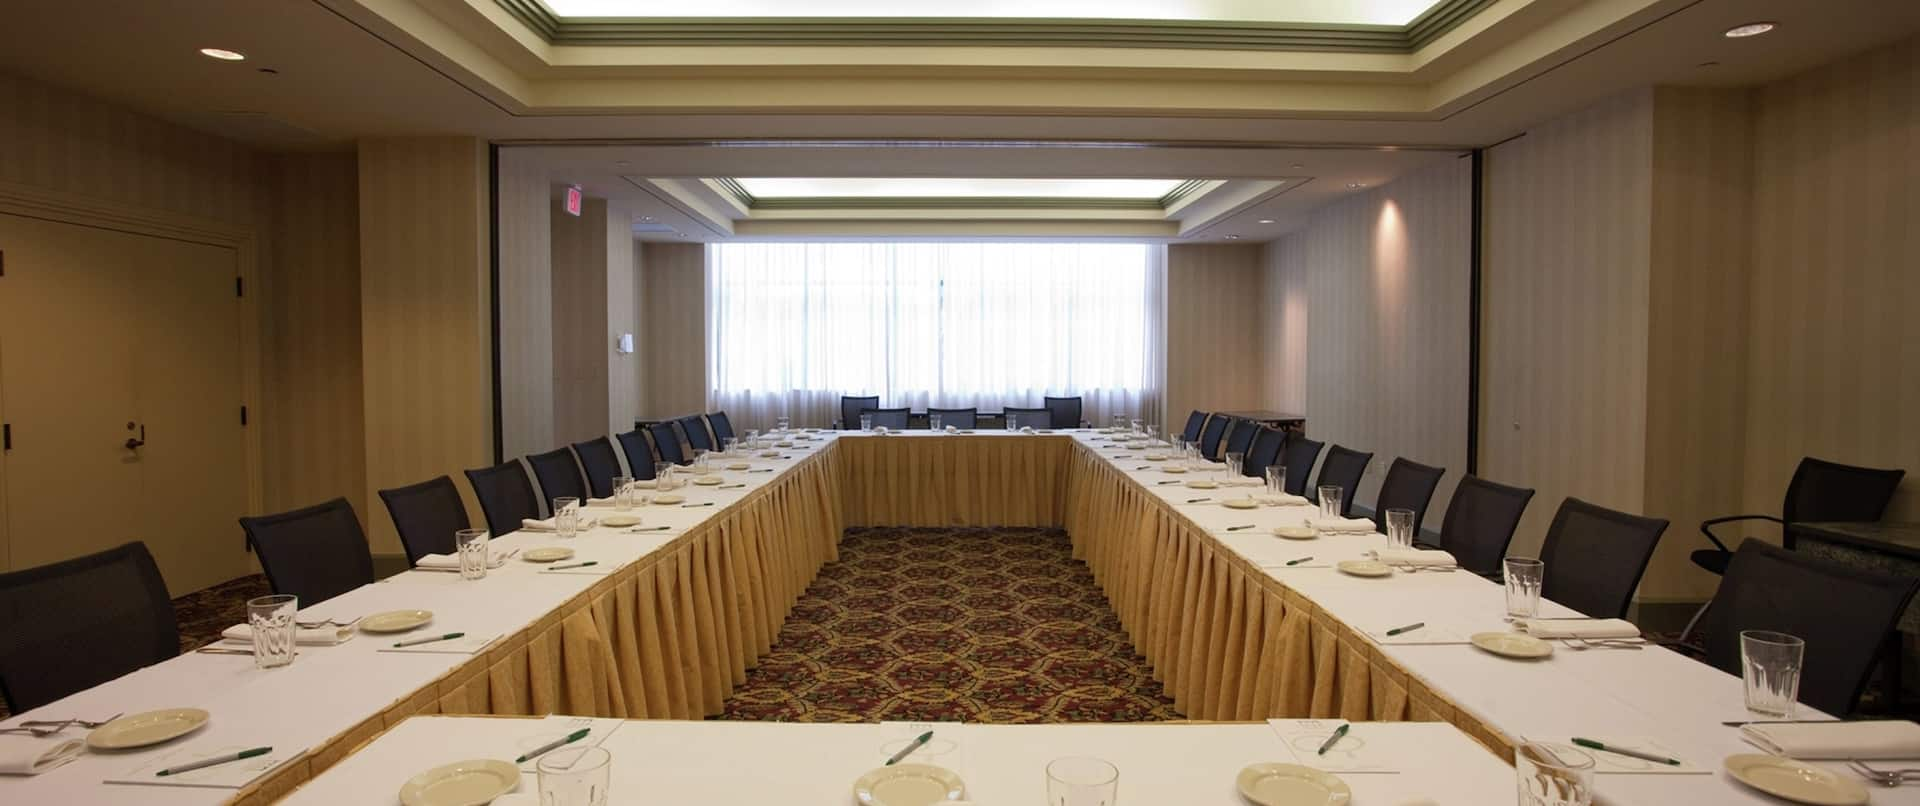 Celebration Meeting Room